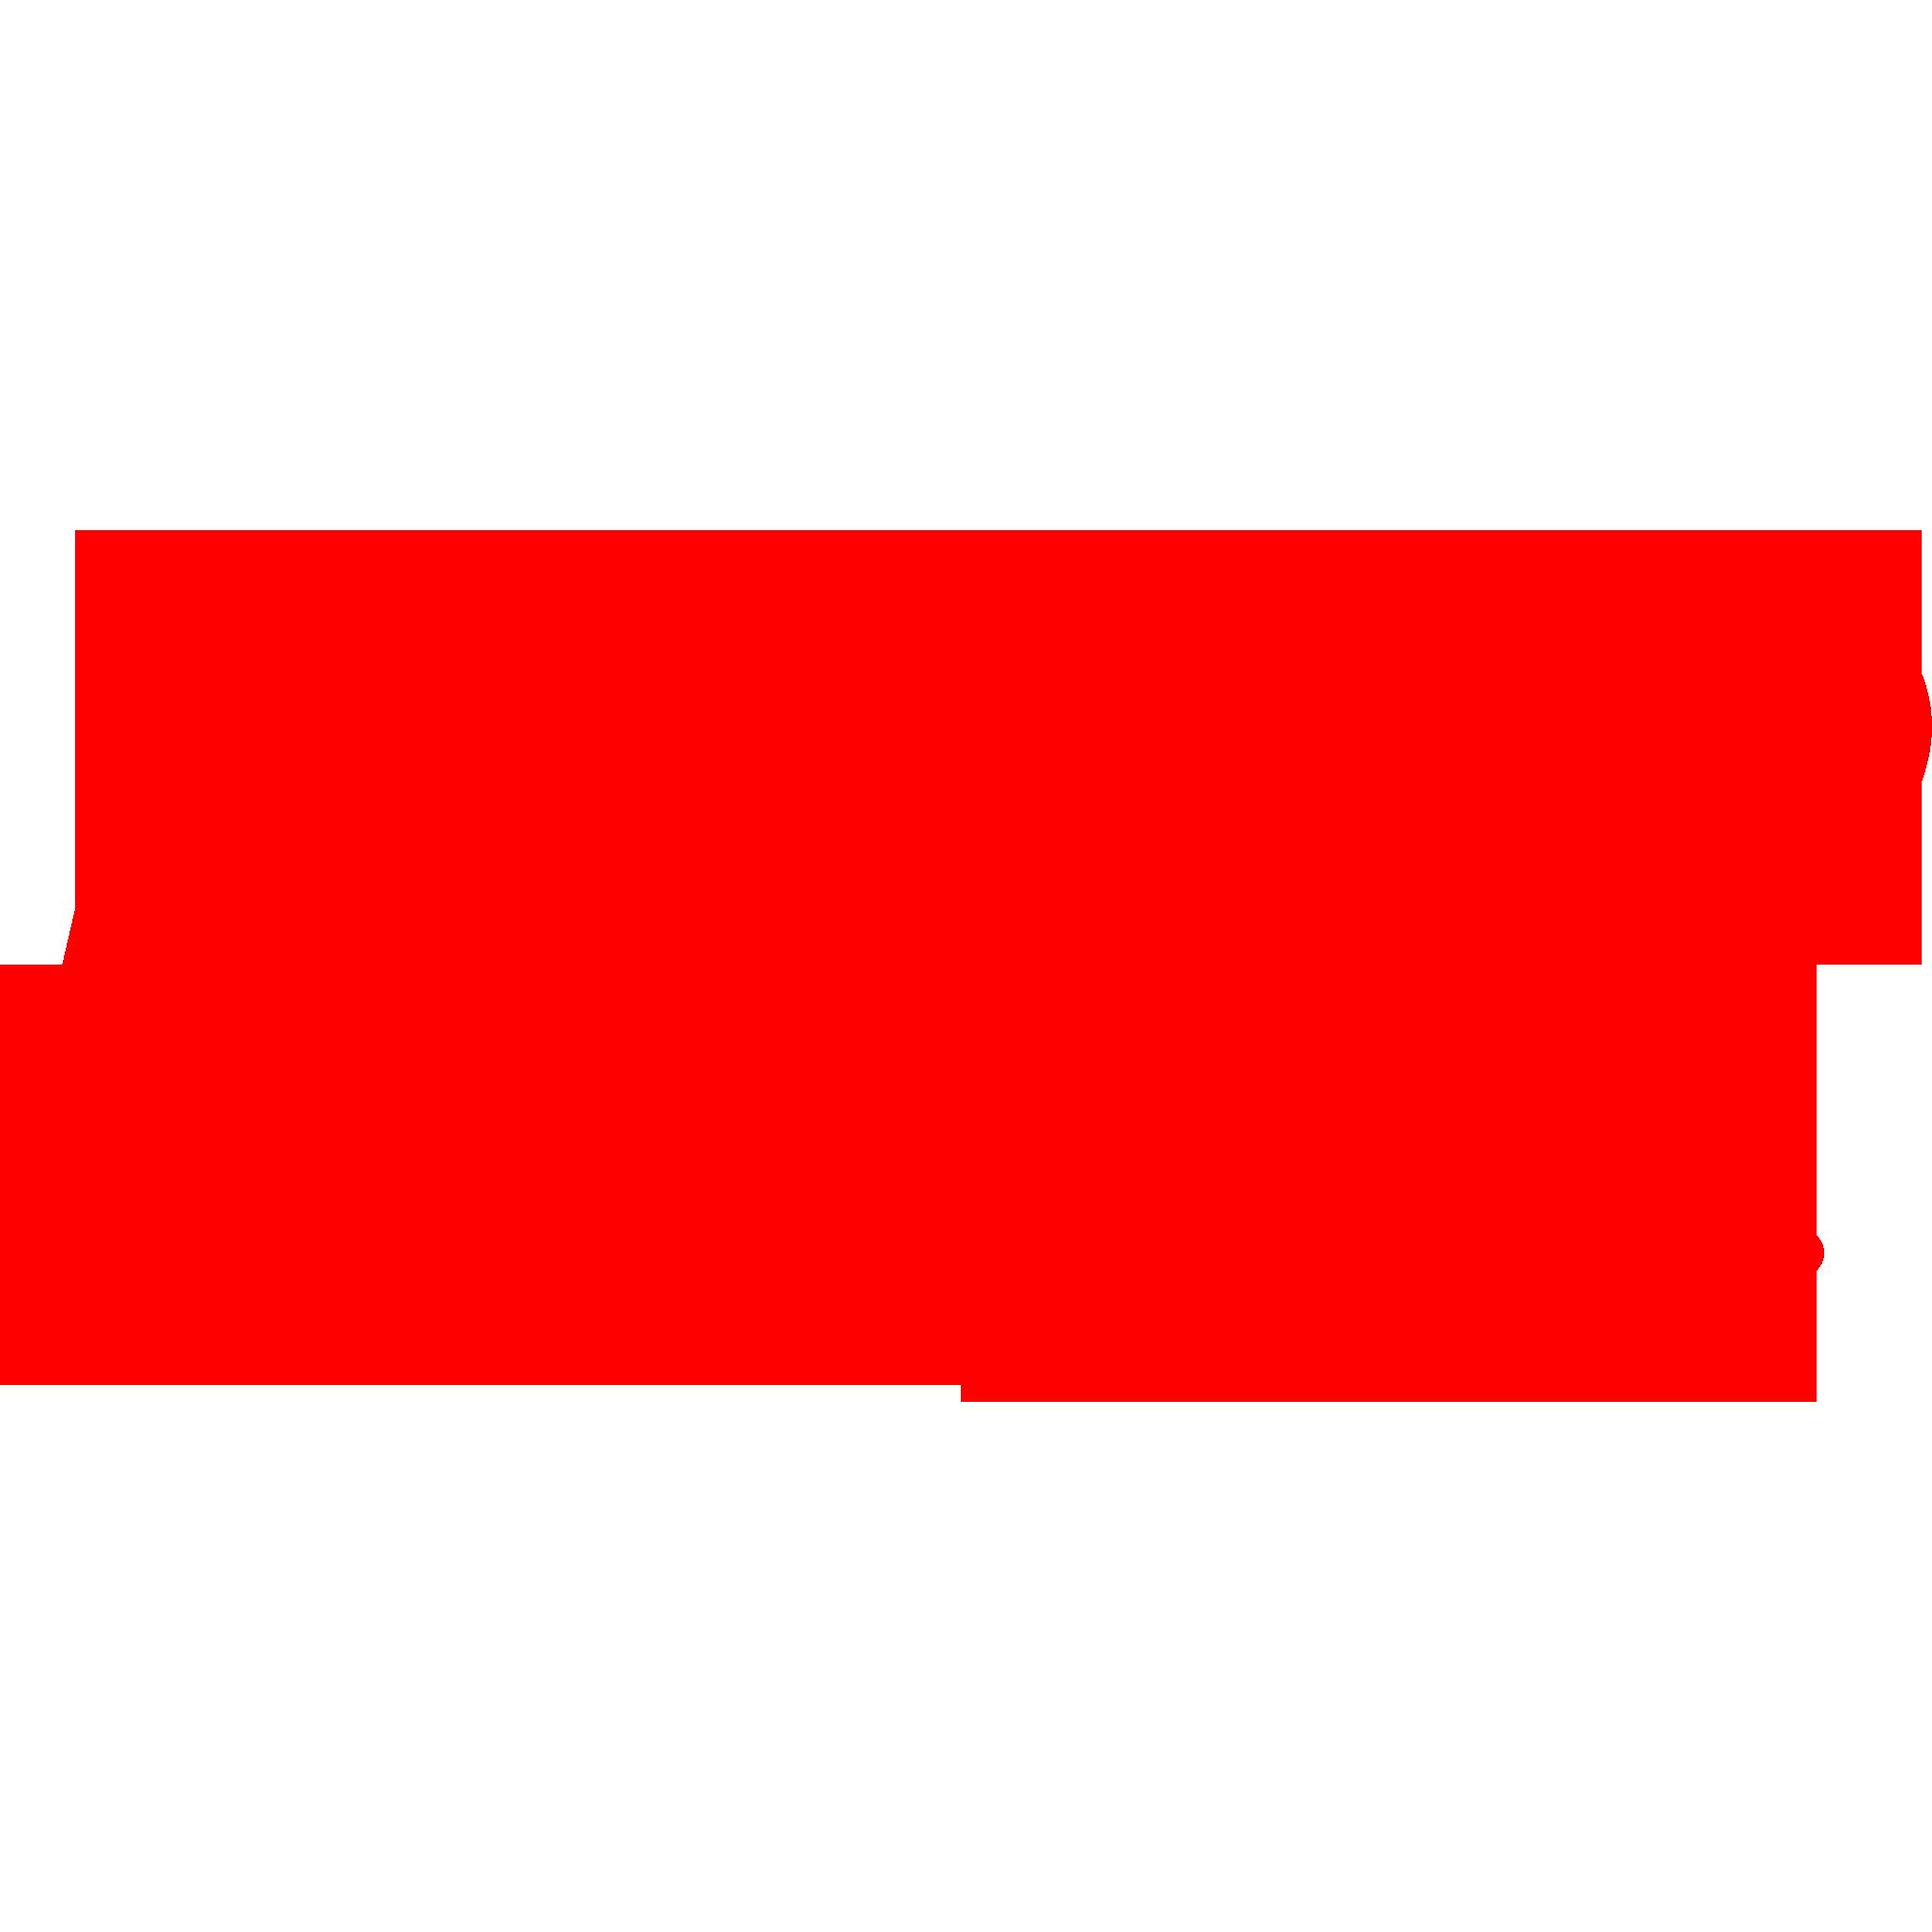 DVD logo Wallpaper